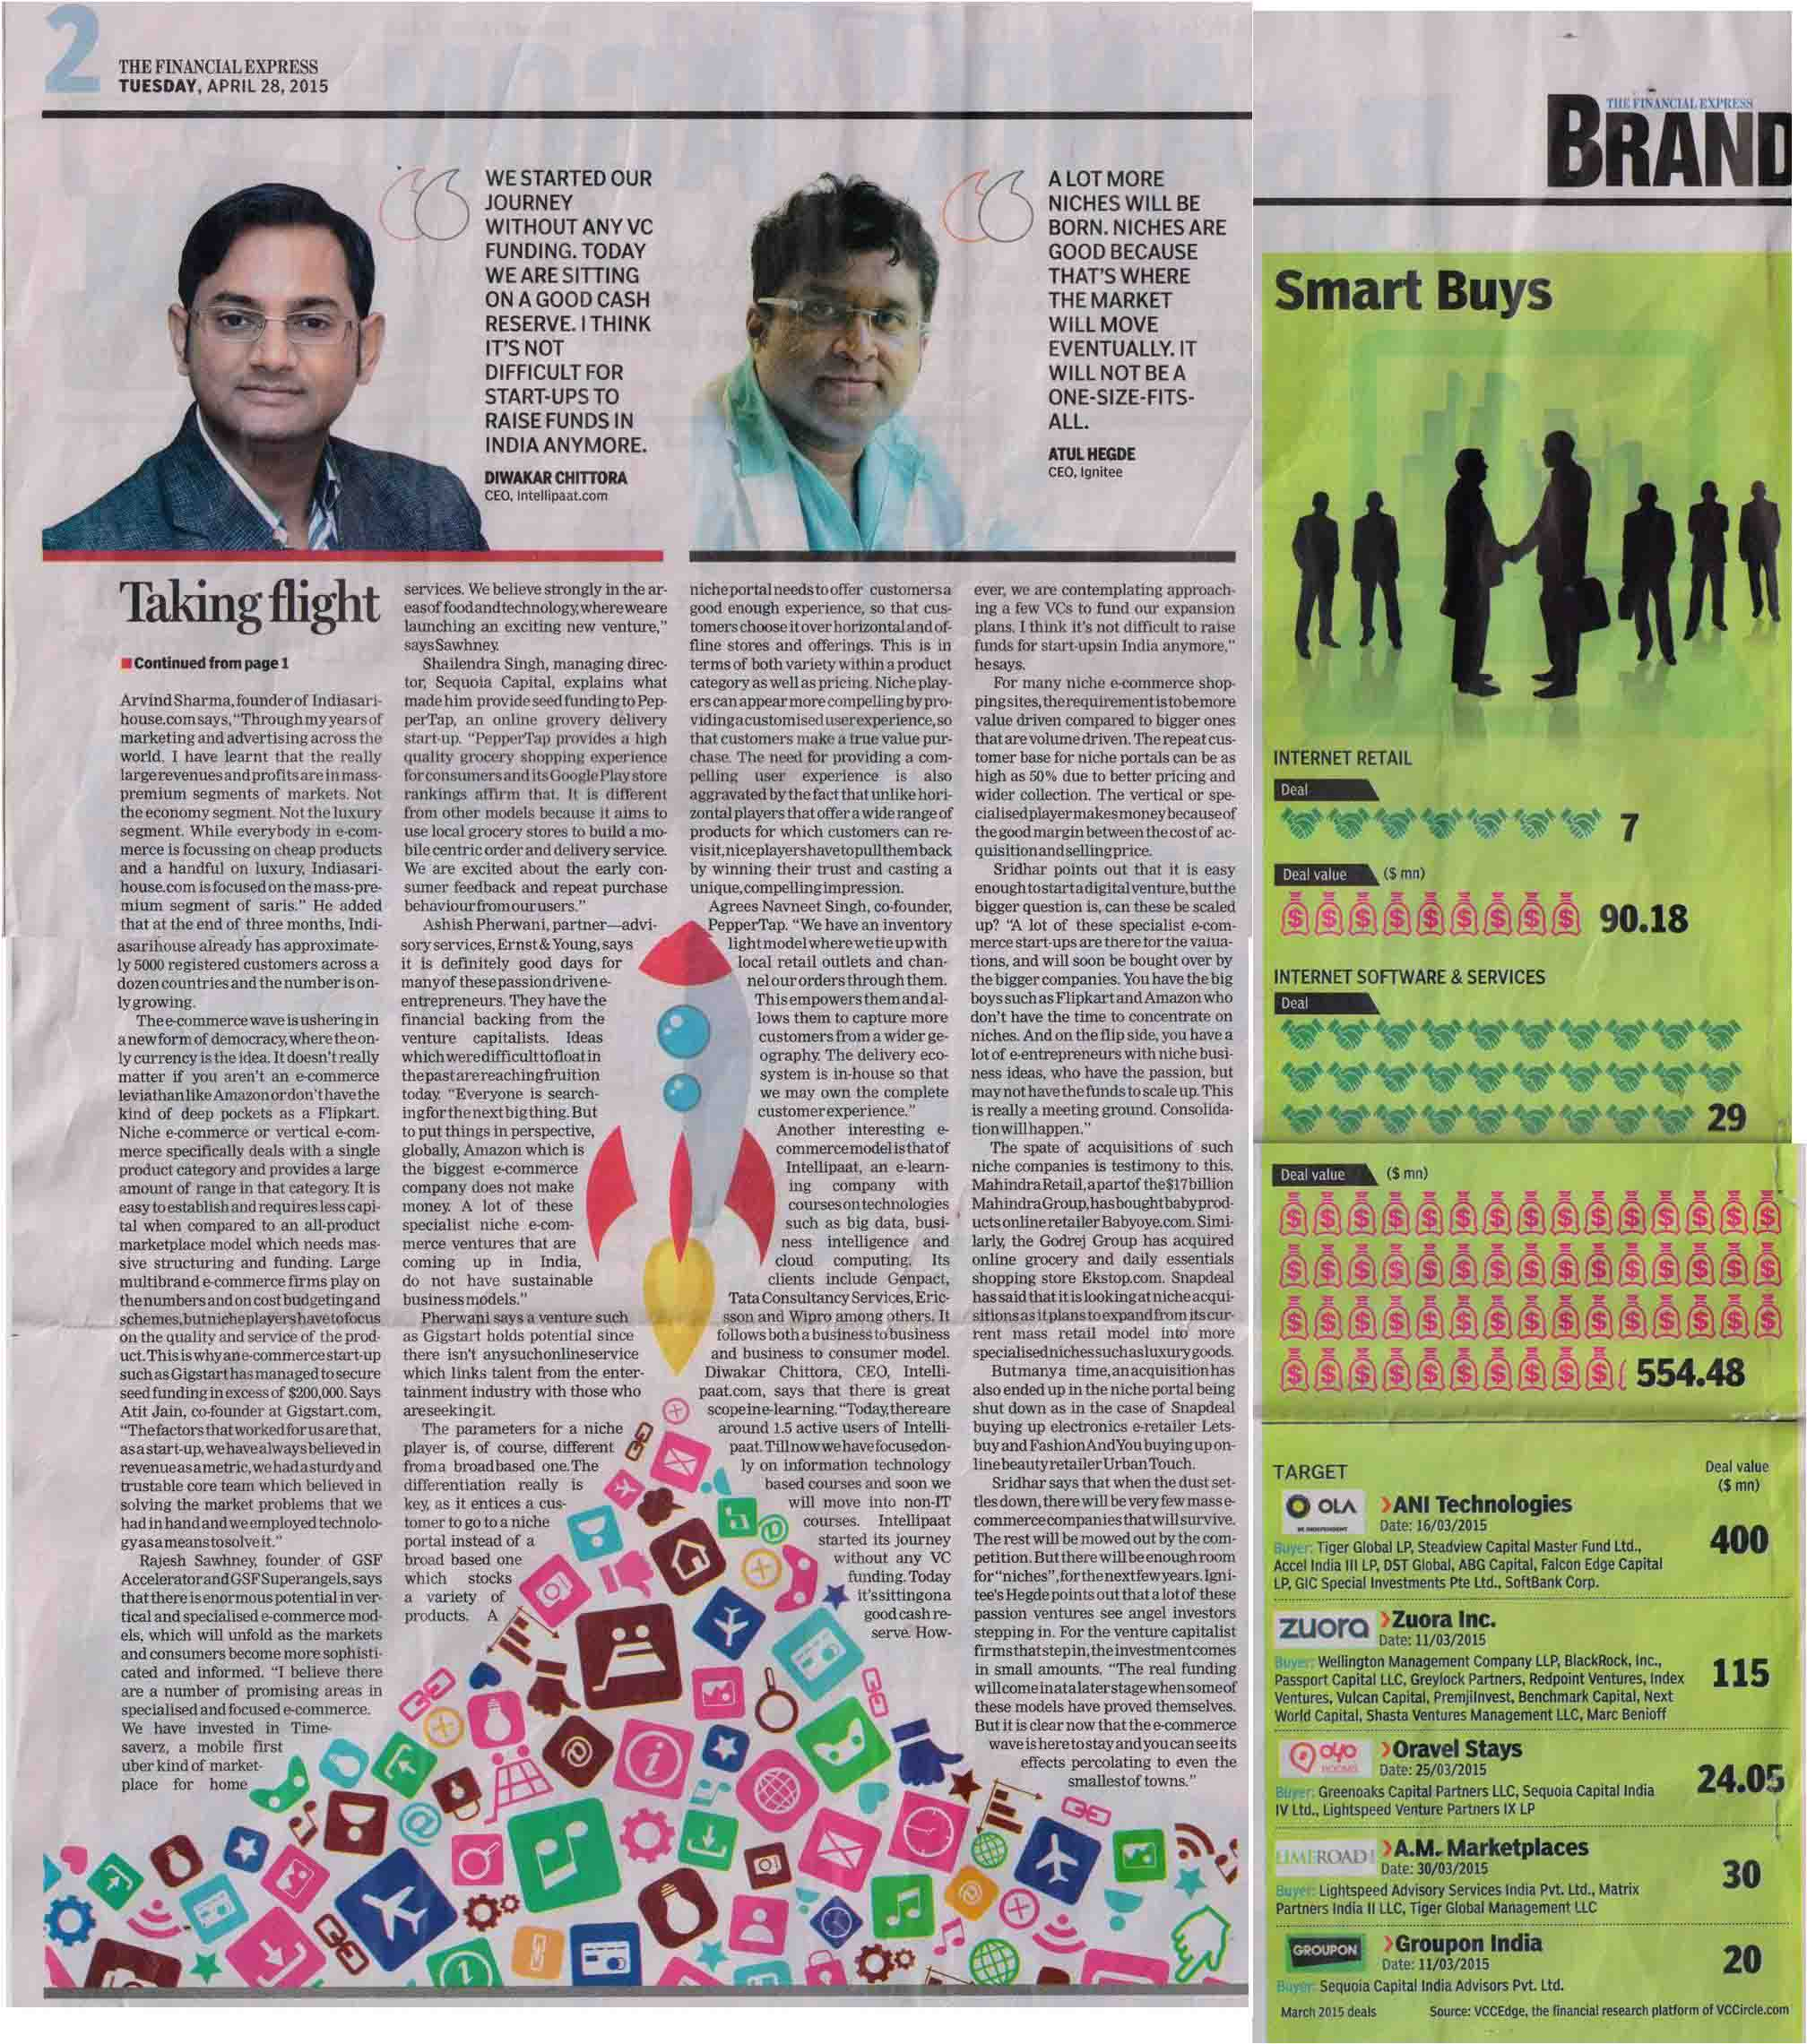 intellipaat-in-media